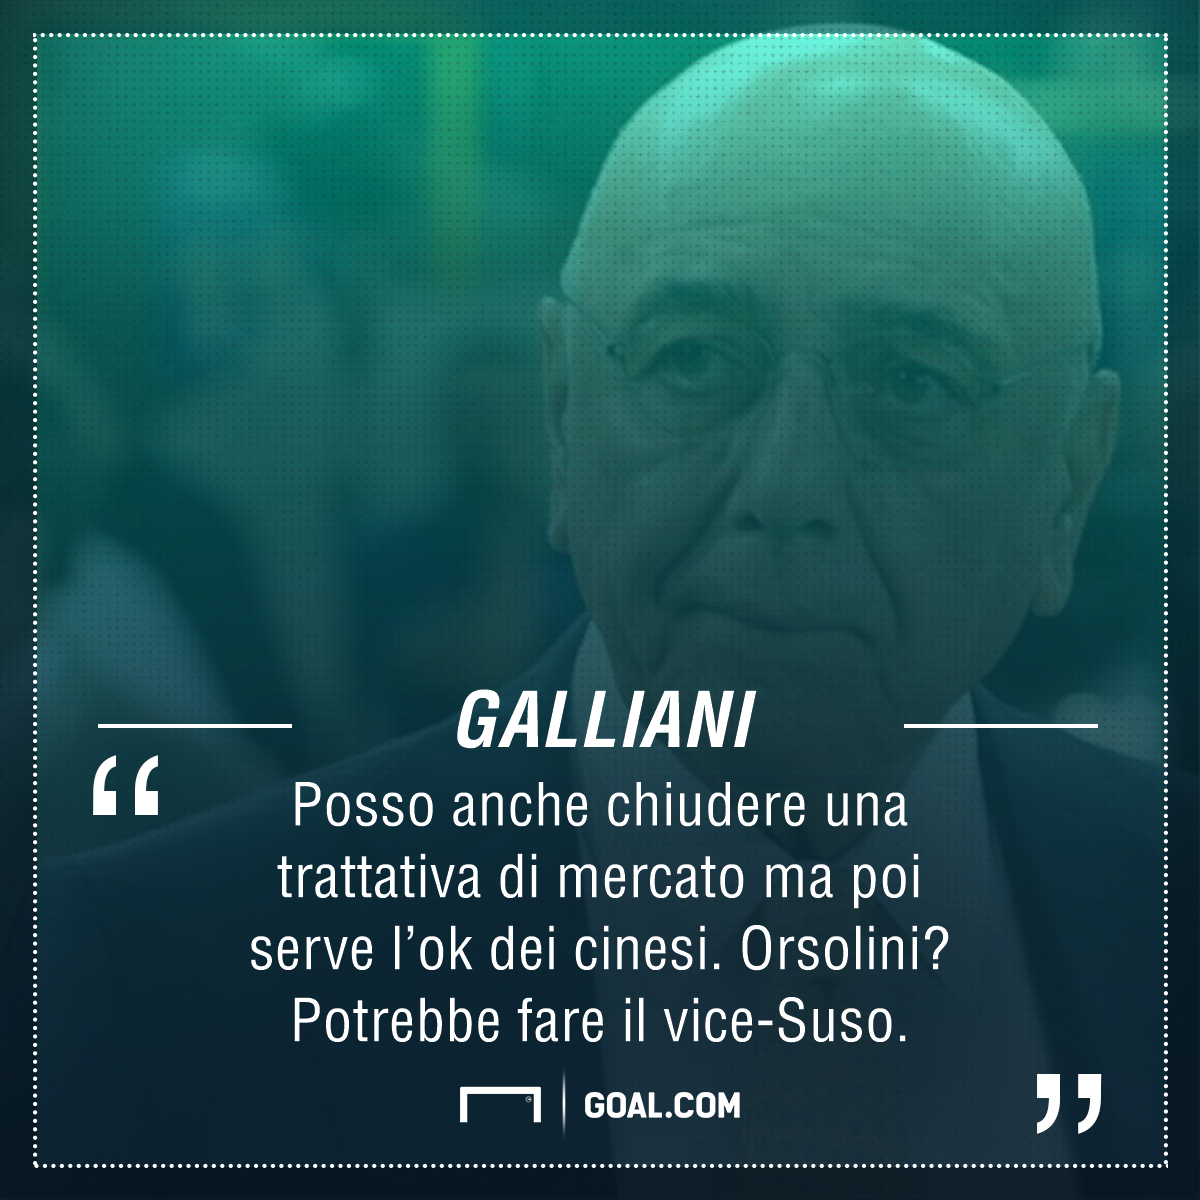 Milan, Galliani: